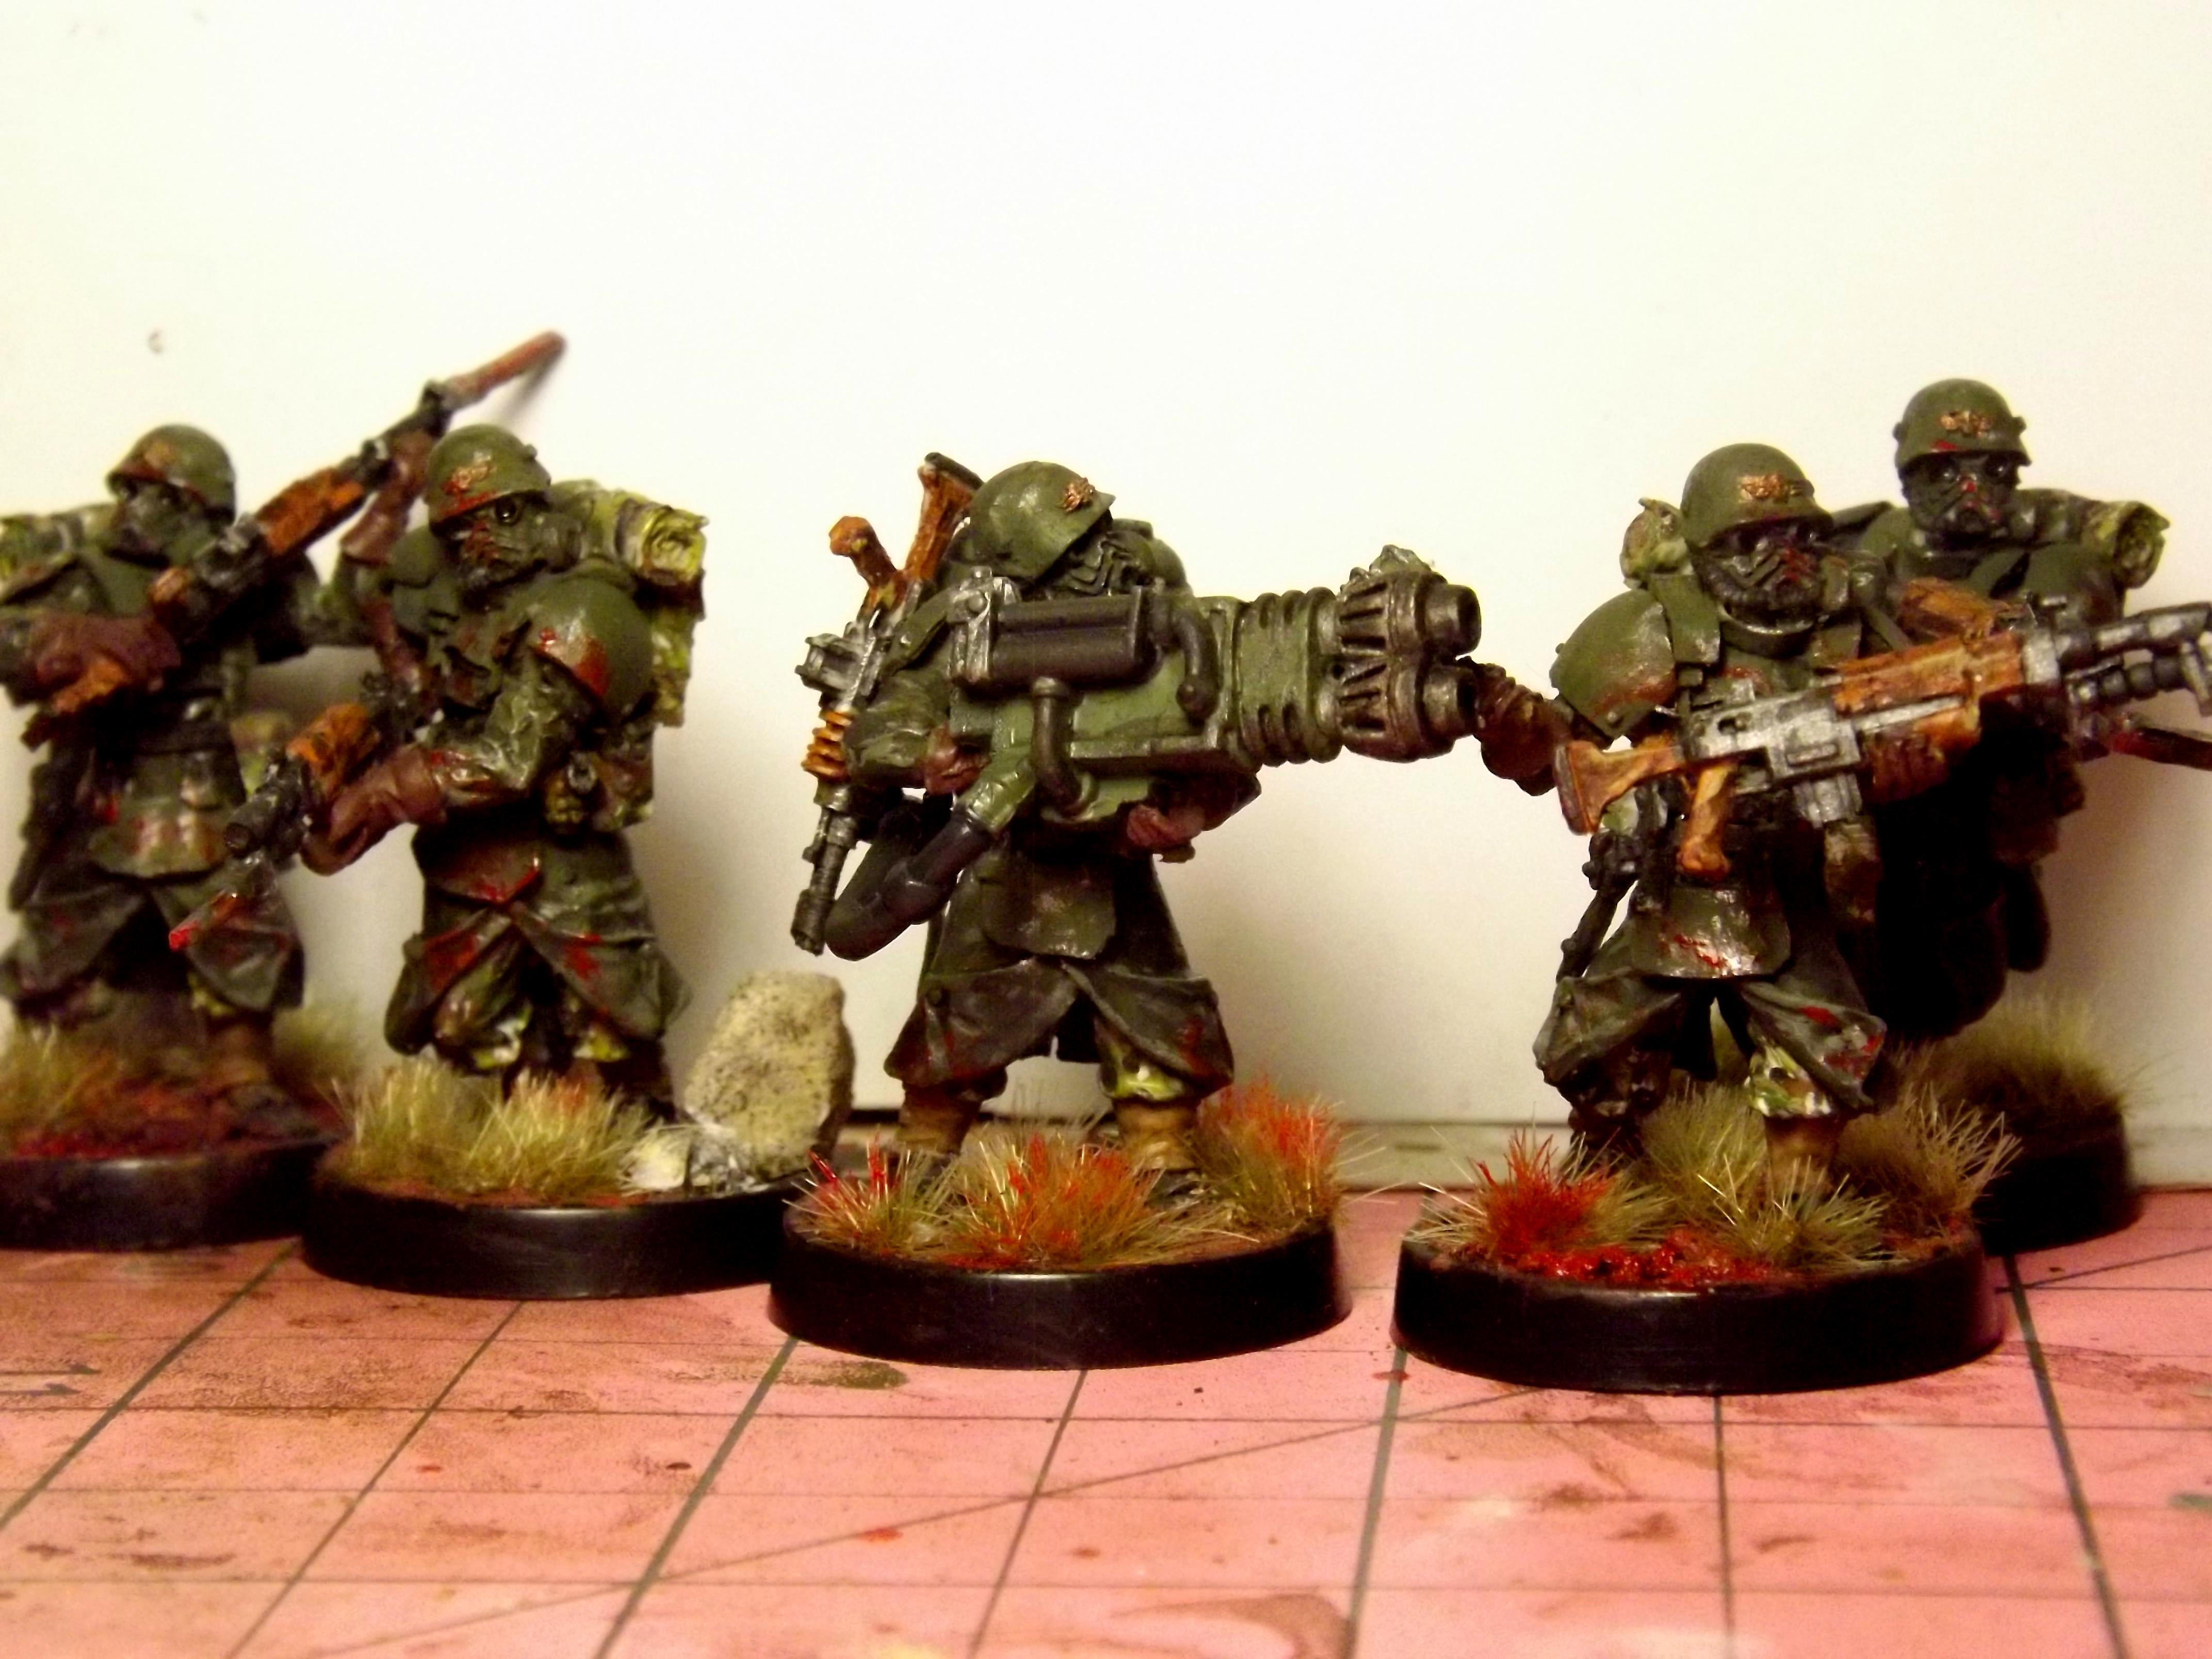 Assault Corp, Battle Lasers, Carapace Armour, Conversion, Greatcoats, Grenadiers, Guardsmen, Heavy Flamer, Heavy Flamer Conversion, Imperial Guard, Melee, Victoria Miniatures